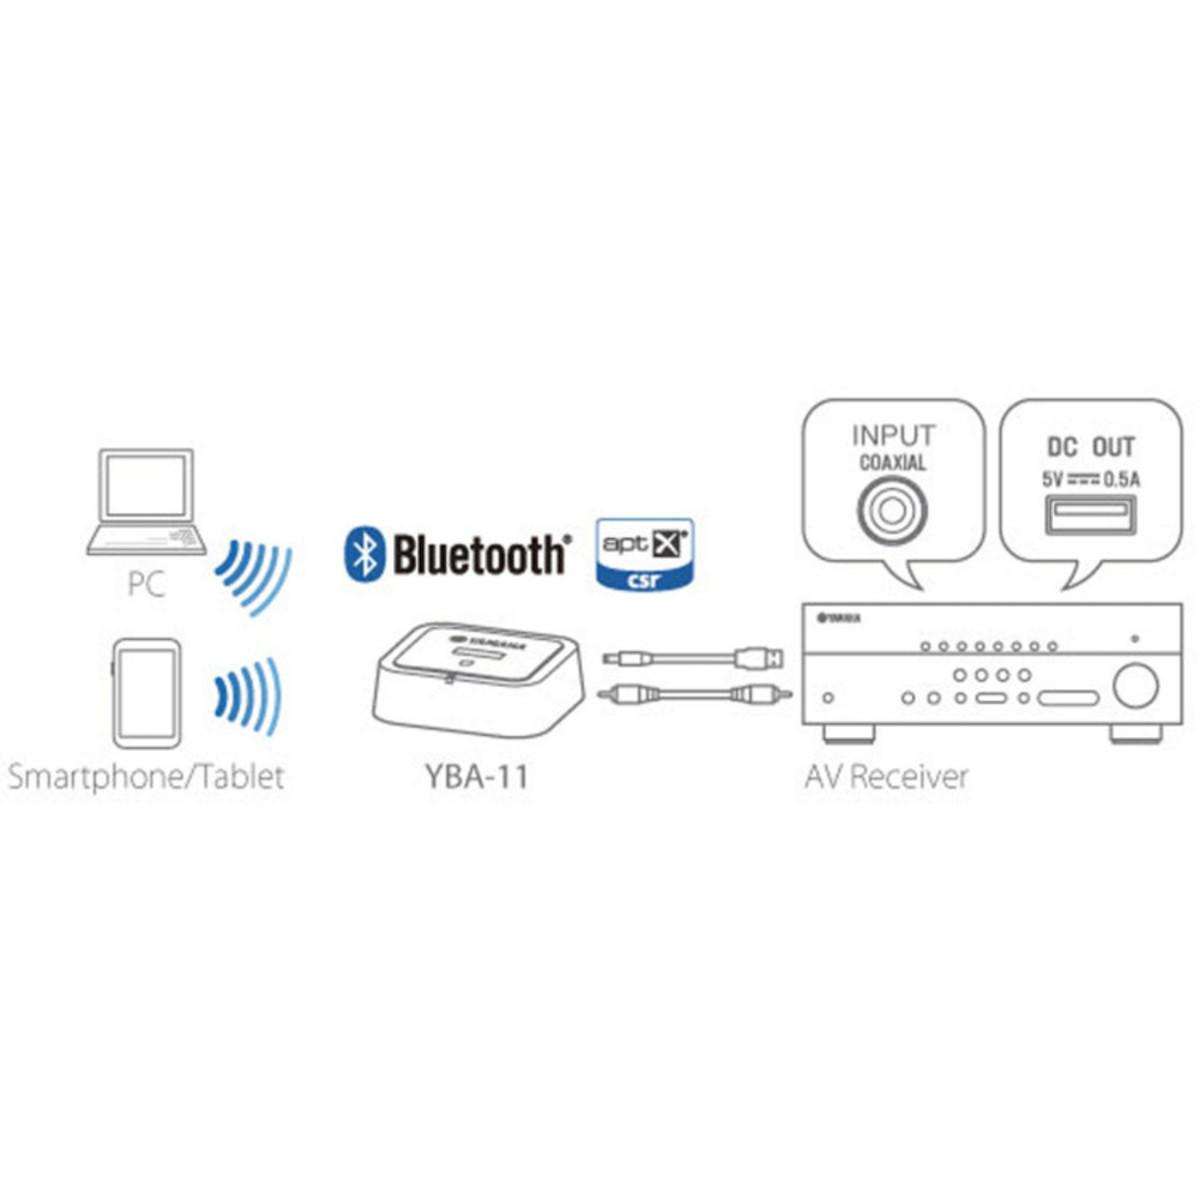 Yamaha Yba Bluetooth Receiver Pairing